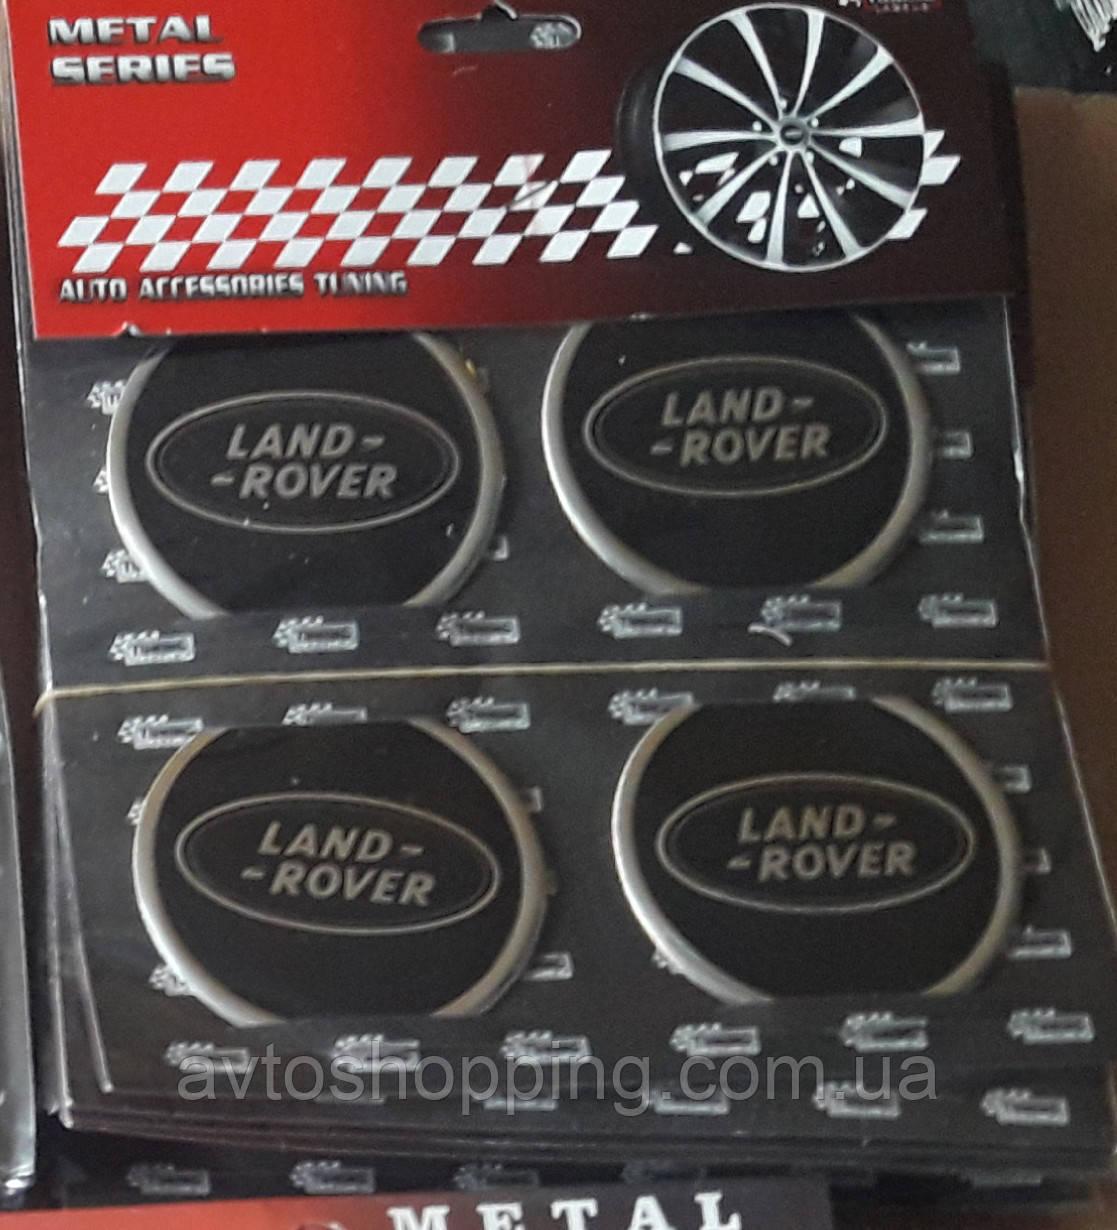 Наклейки на колпачки, заглушки, наклейки на диски 60 мм Land Rover (Ленд Ровер)